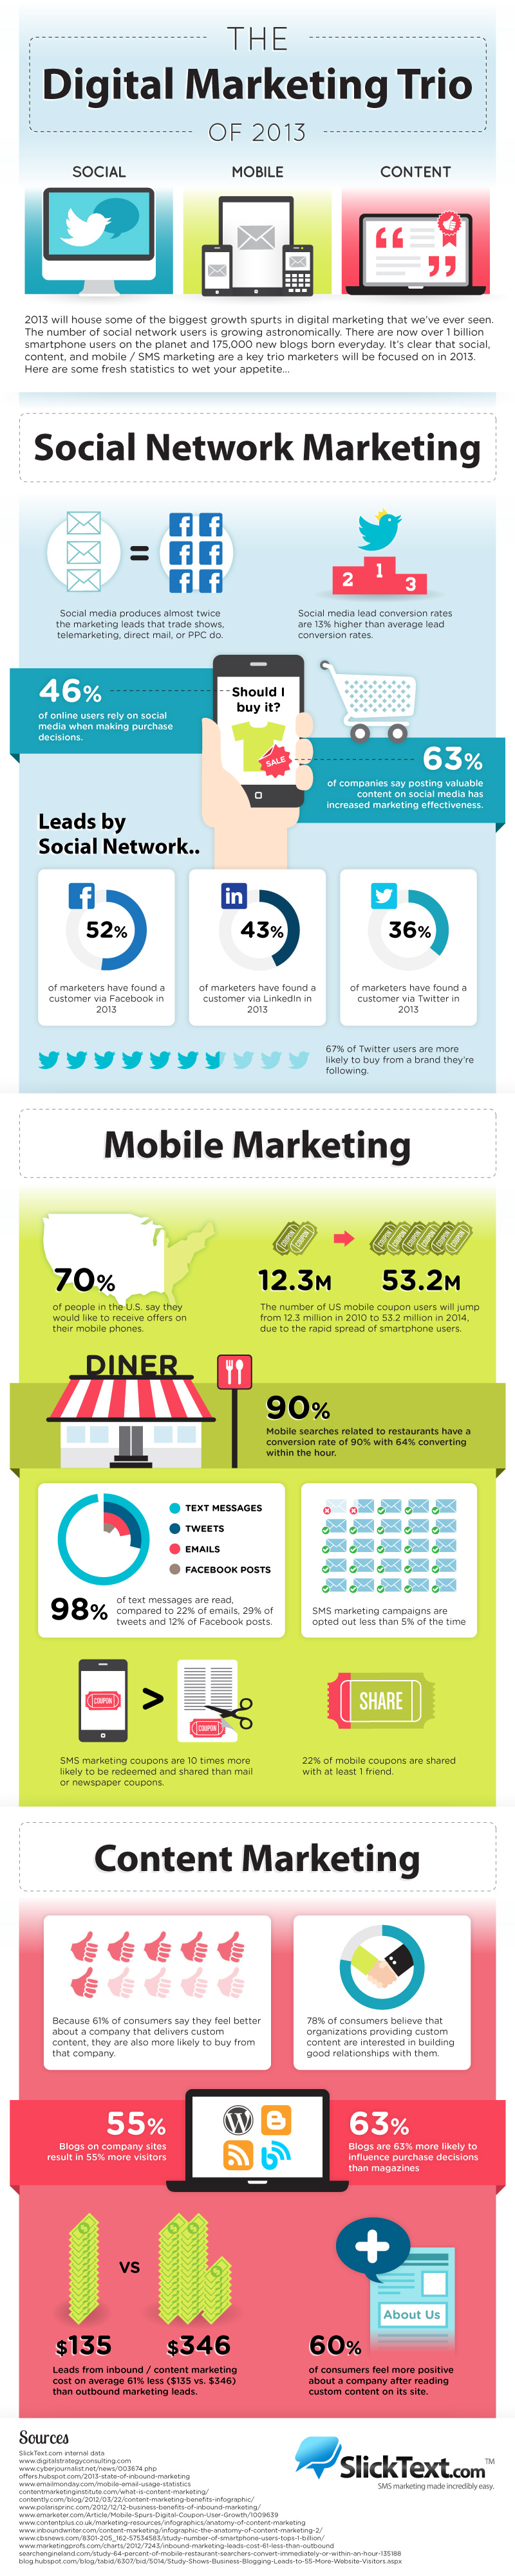 Digital marketing, social network marketing, mobile marketing, content marketing,